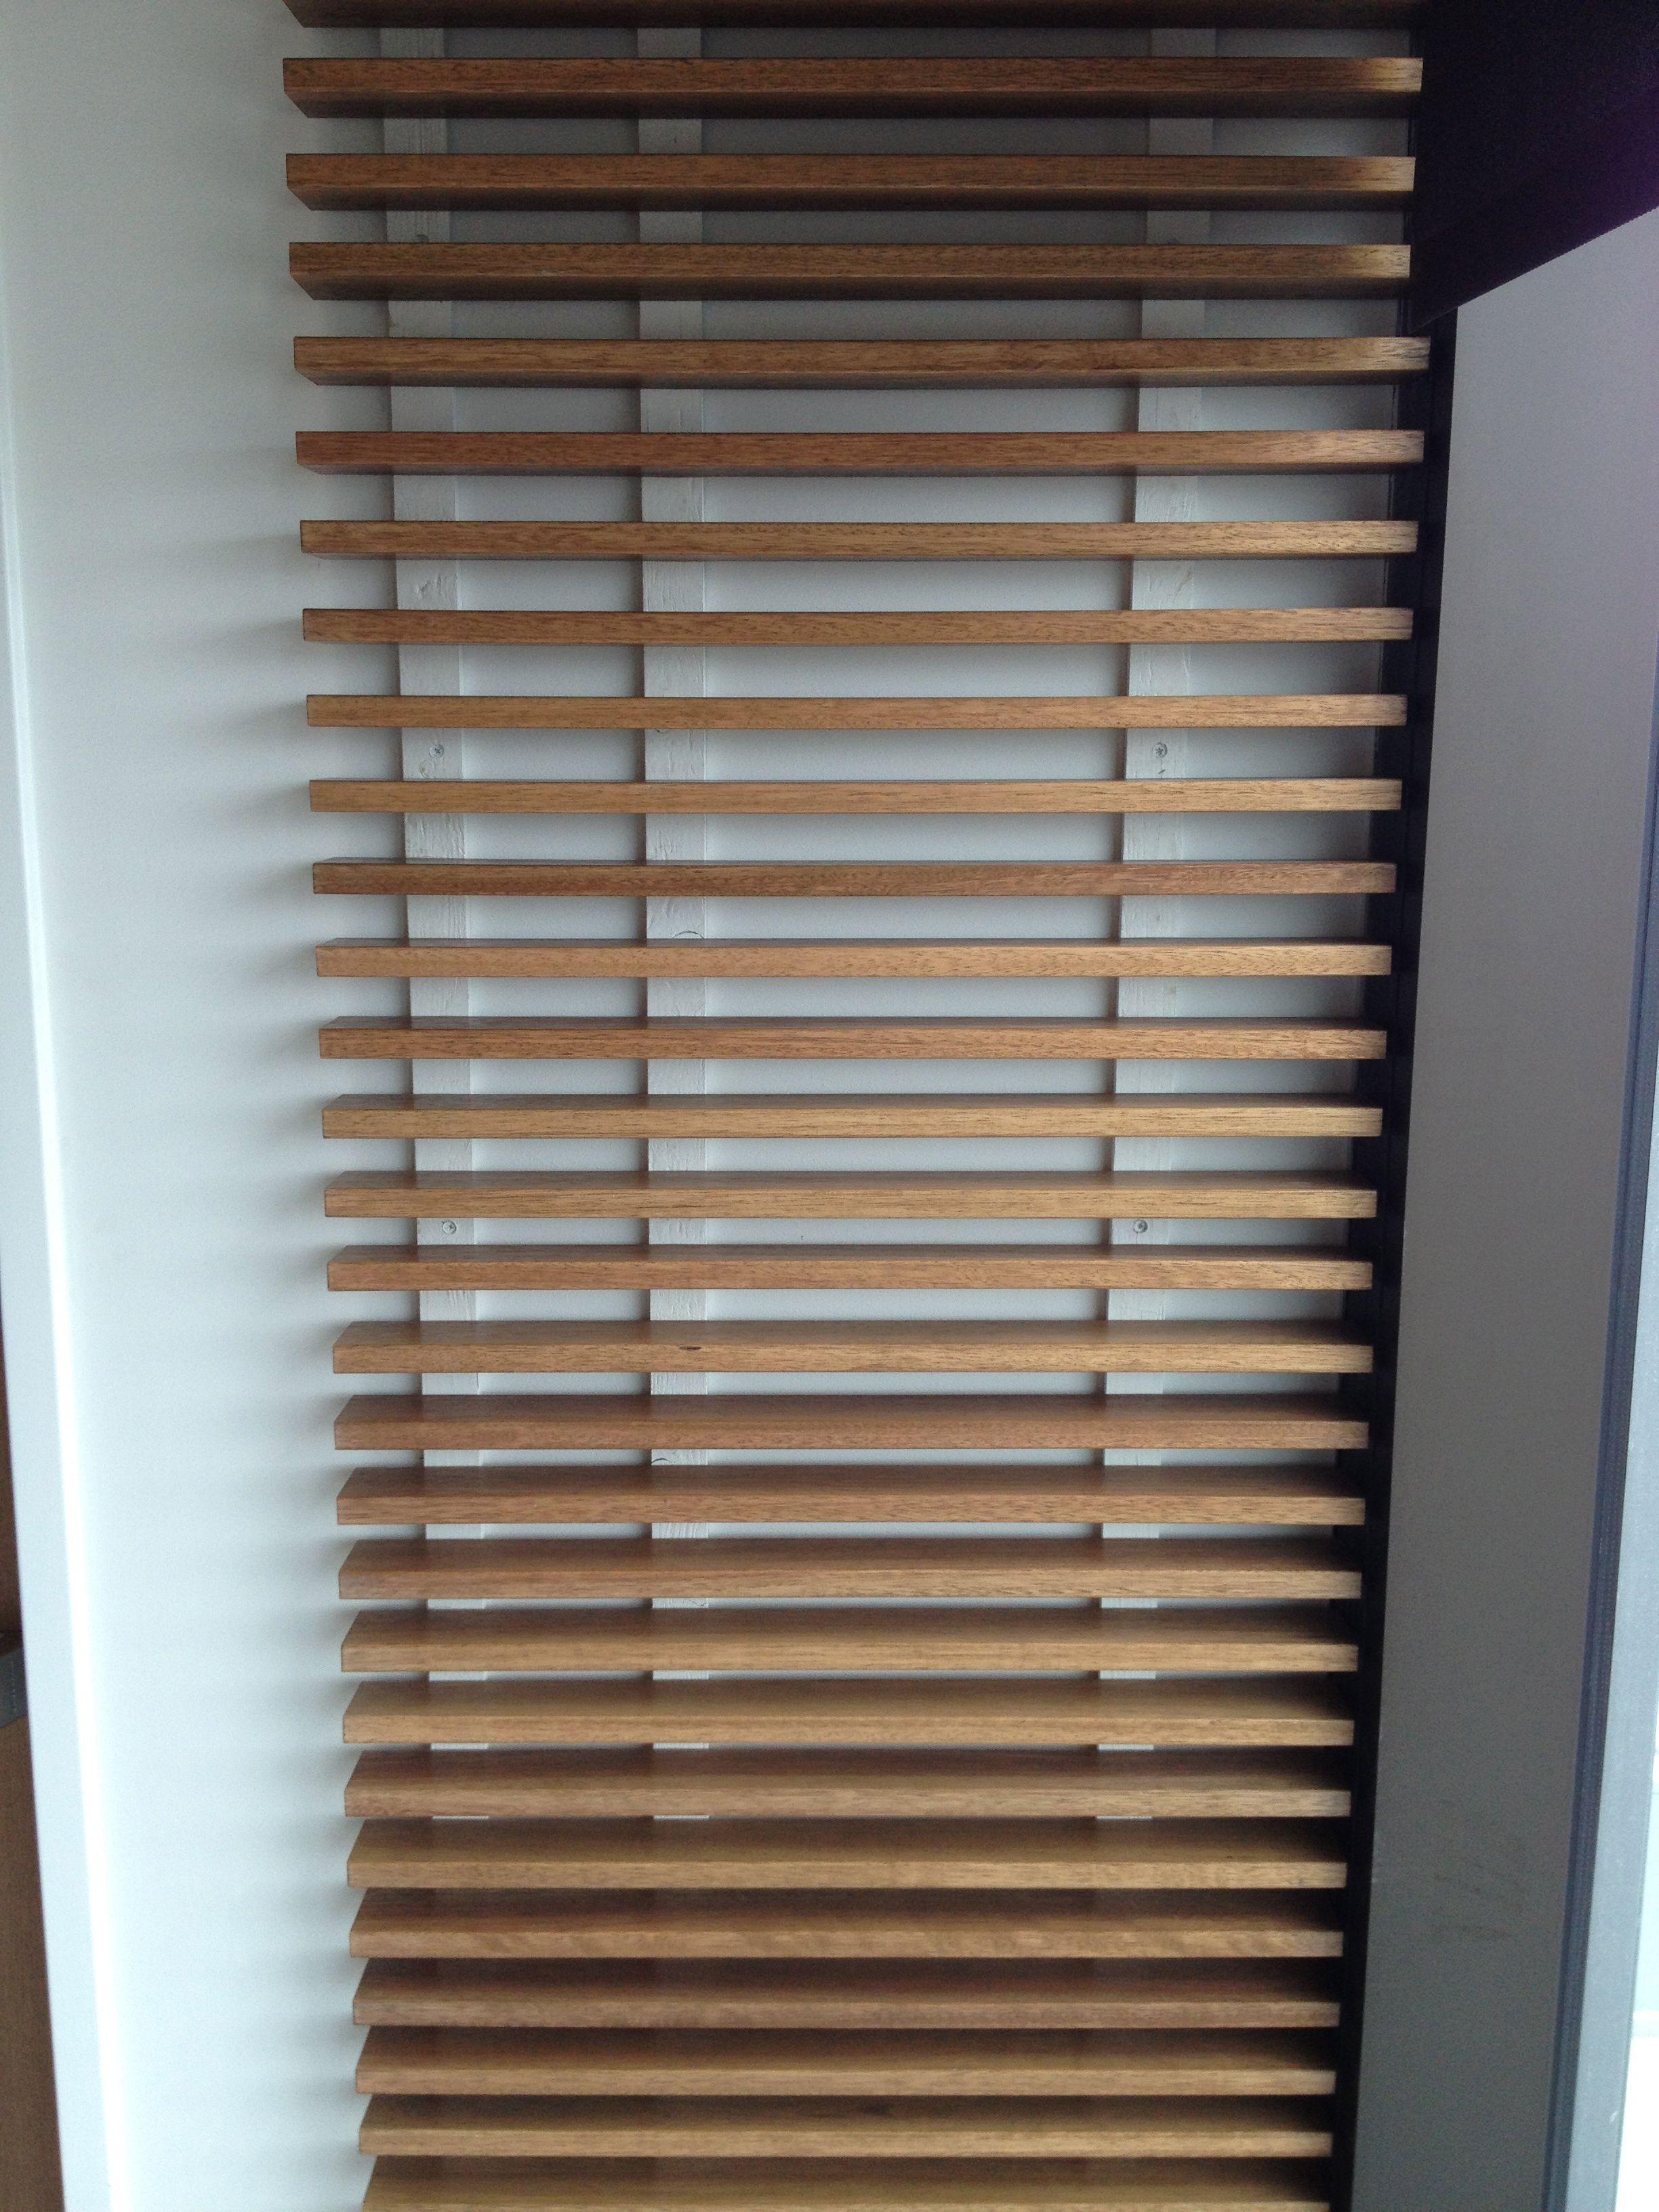 Wood Slat Wall Wood Slat Walls Pinterest Wood Slat